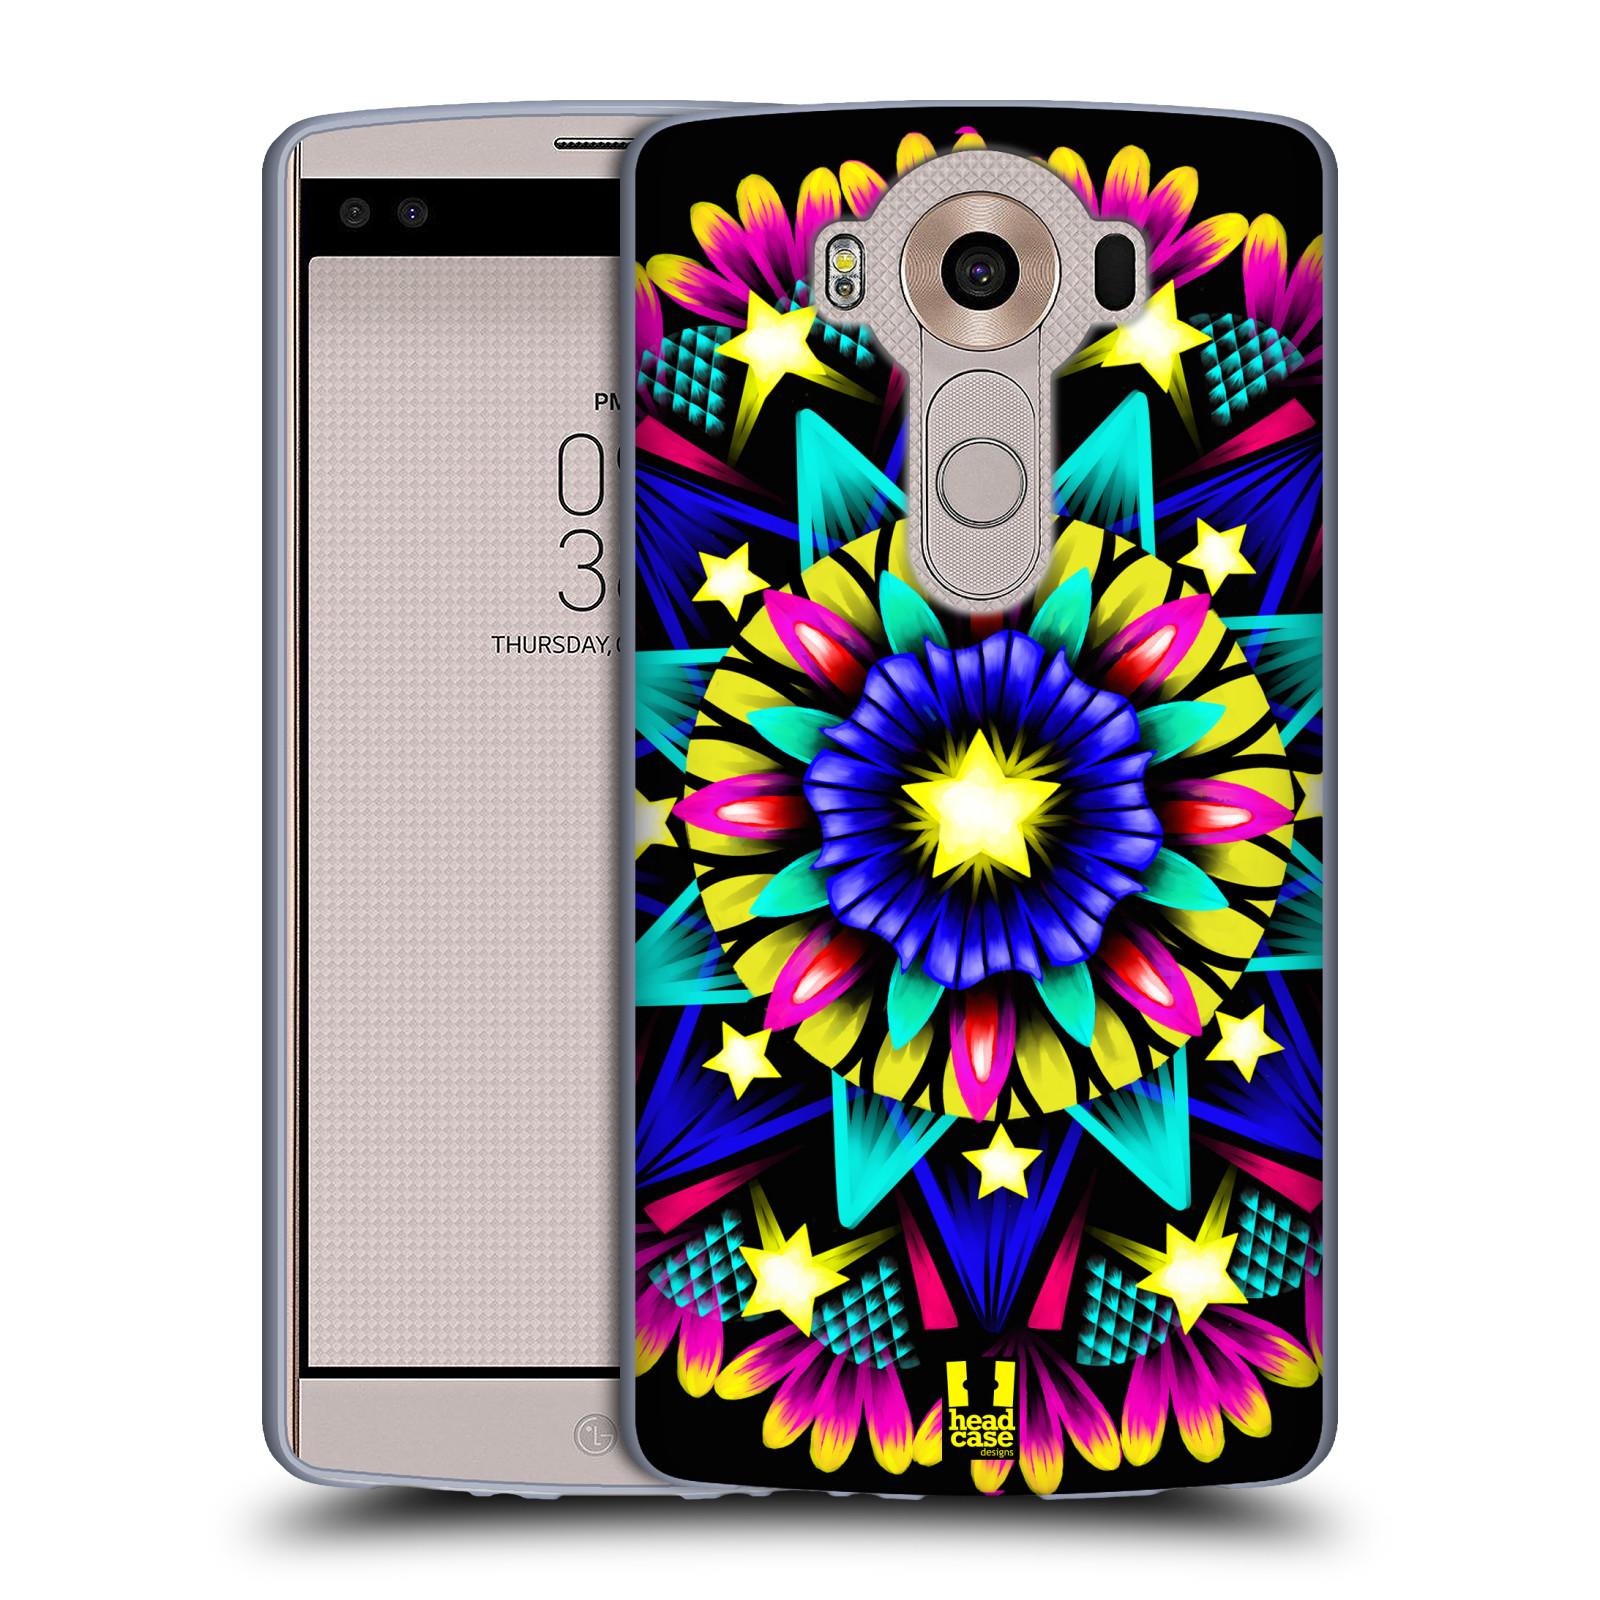 HEAD CASE silikonový obal na mobil LG V10 (H960A) vzor Indie Mandala kaleidoskop barevný vzor HVĚZDA